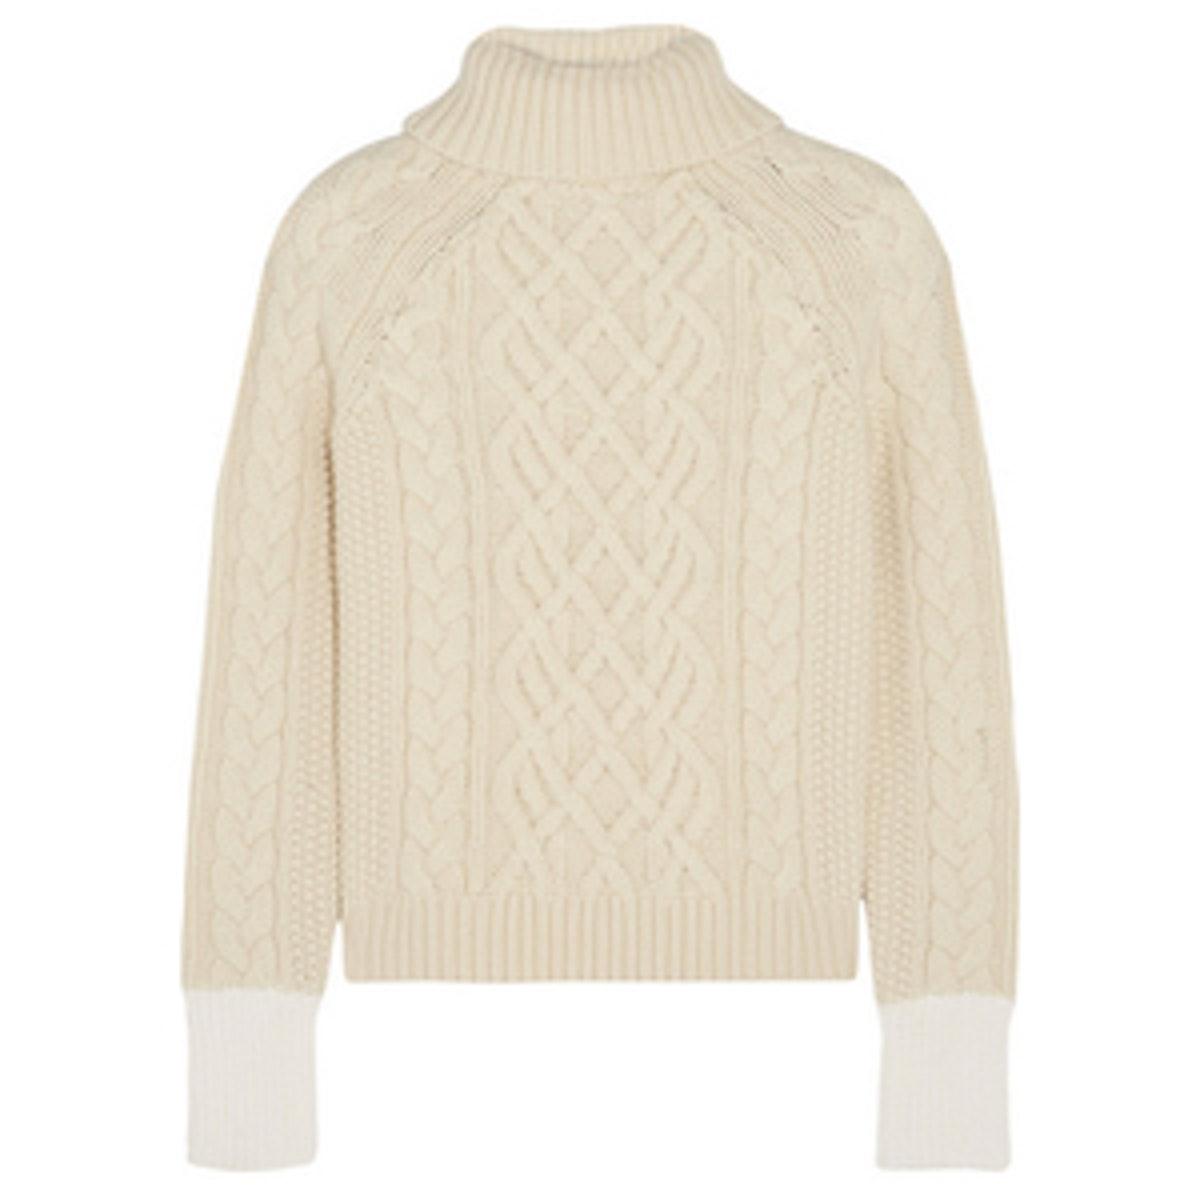 Keswick Turtleneck Sweater